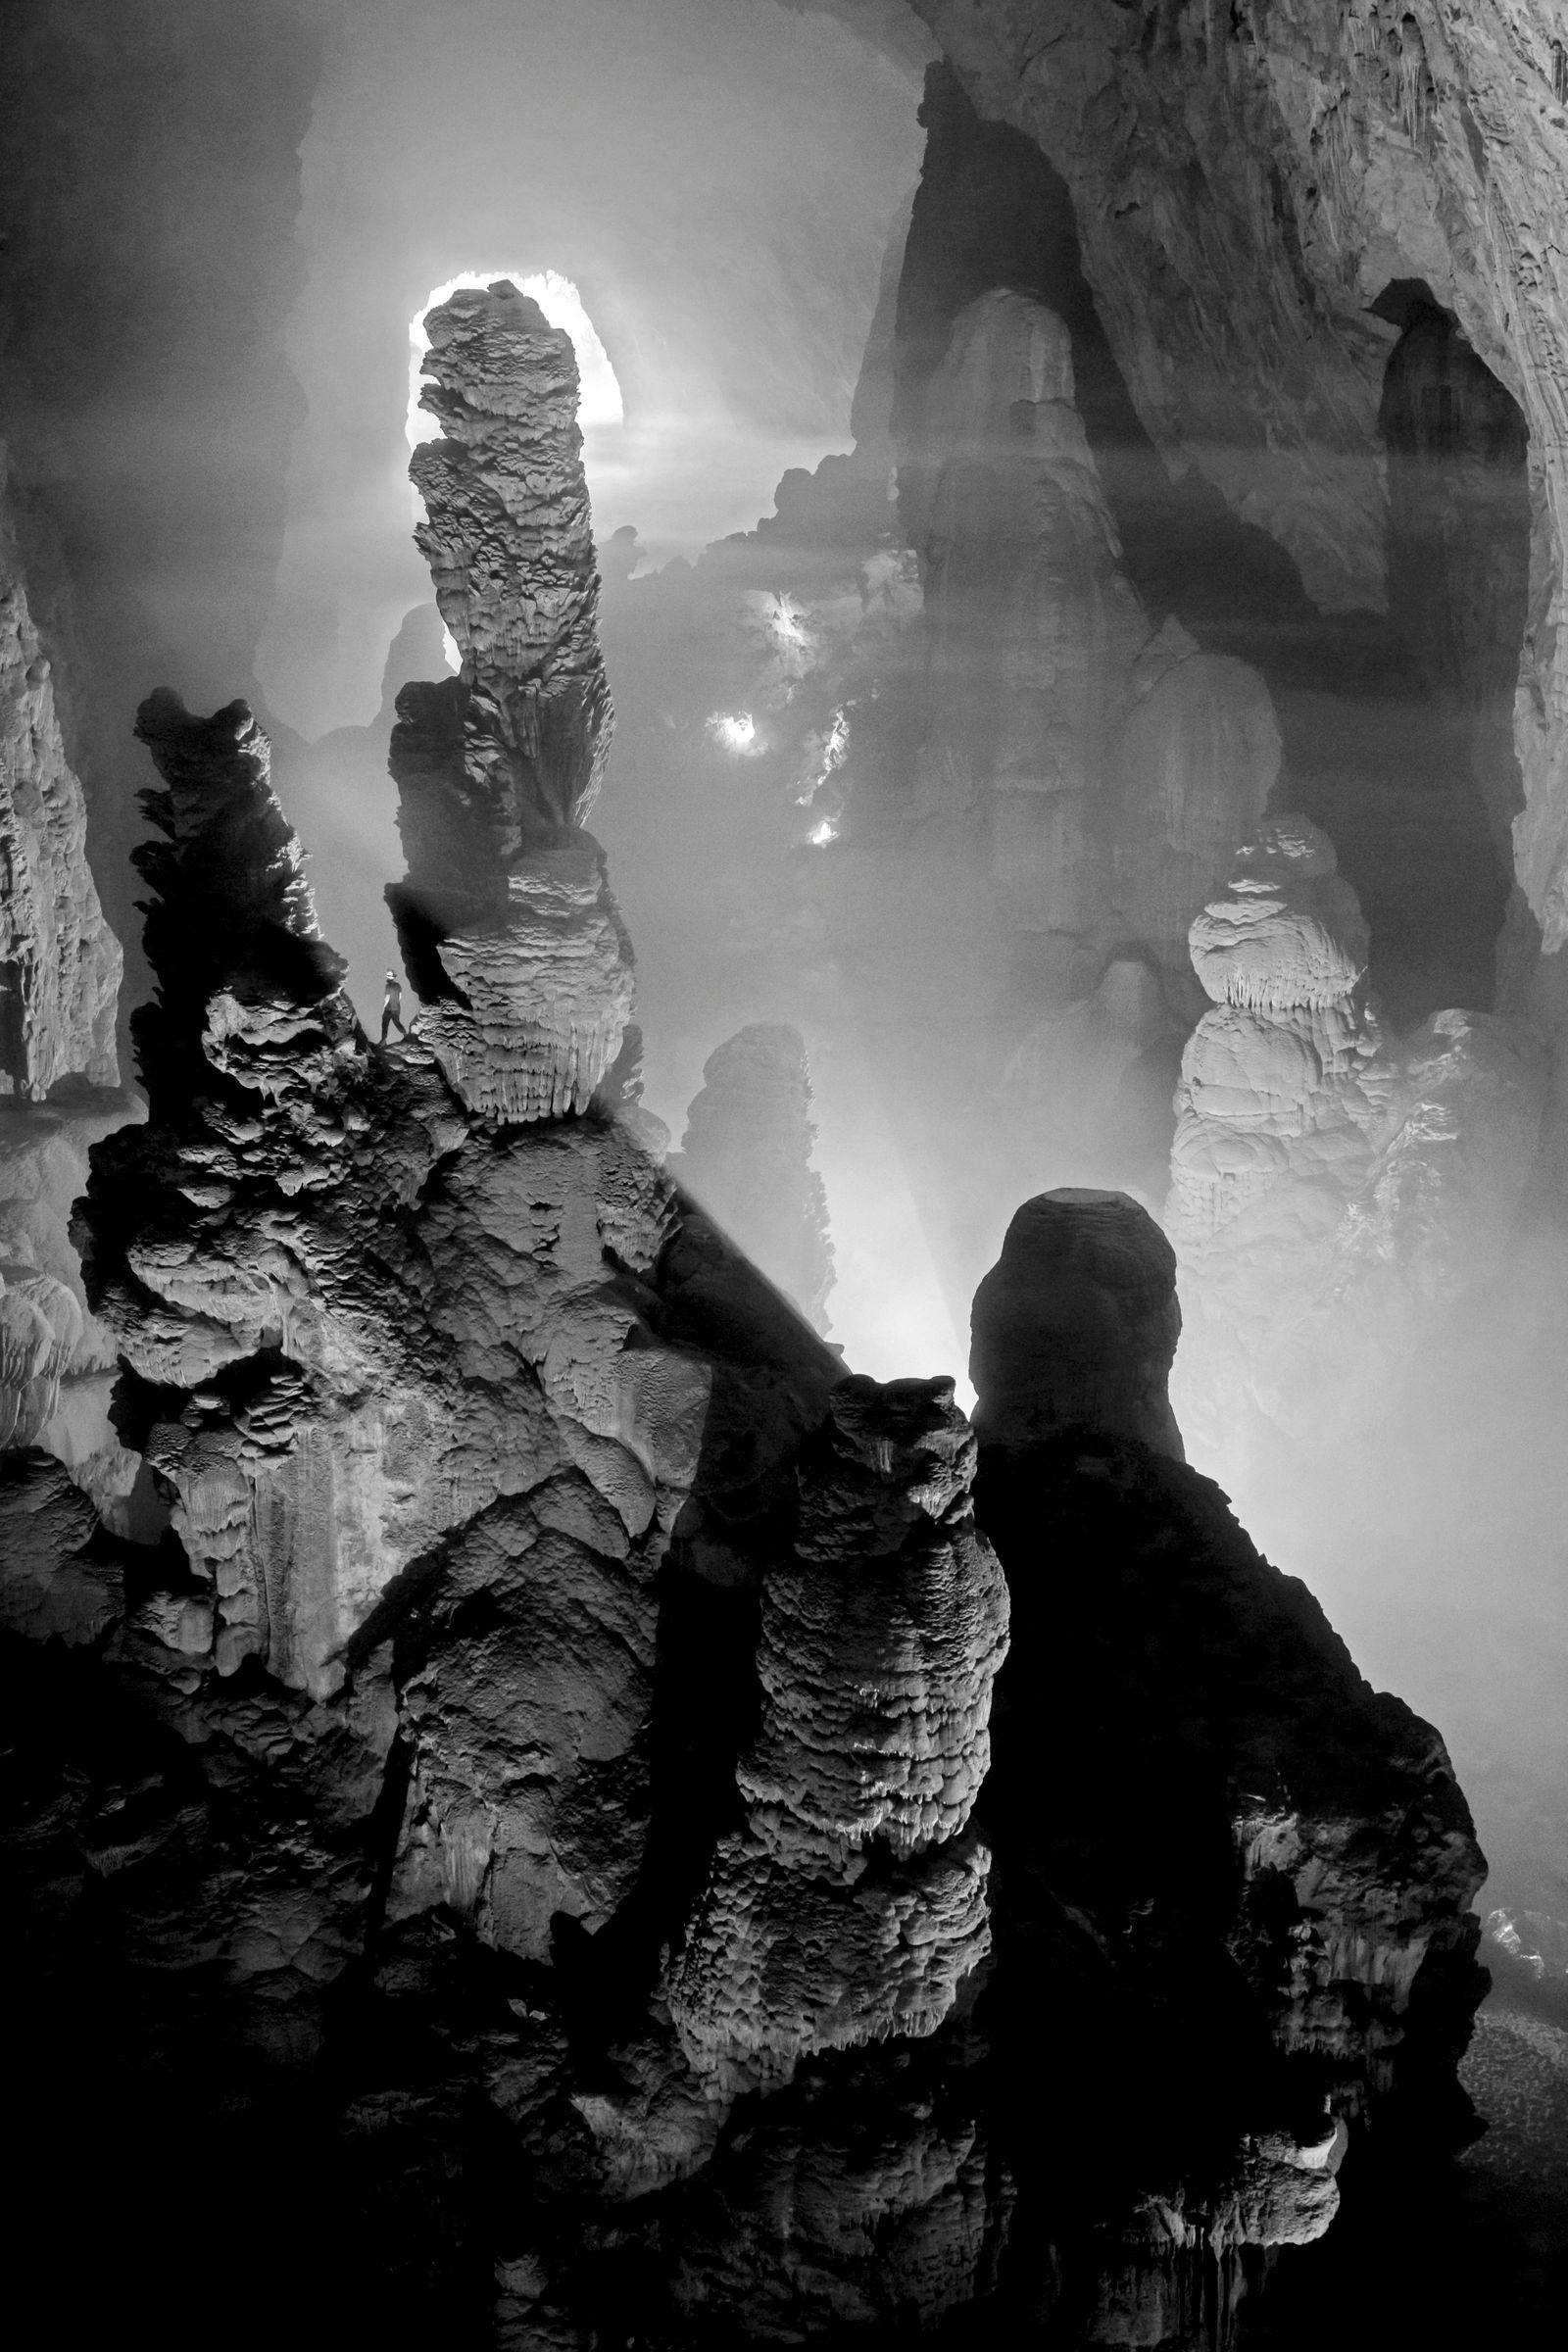 EINMALIGE VERWENDUNG A caver is dwarfed by massive stalagmites in Hang Son Doong